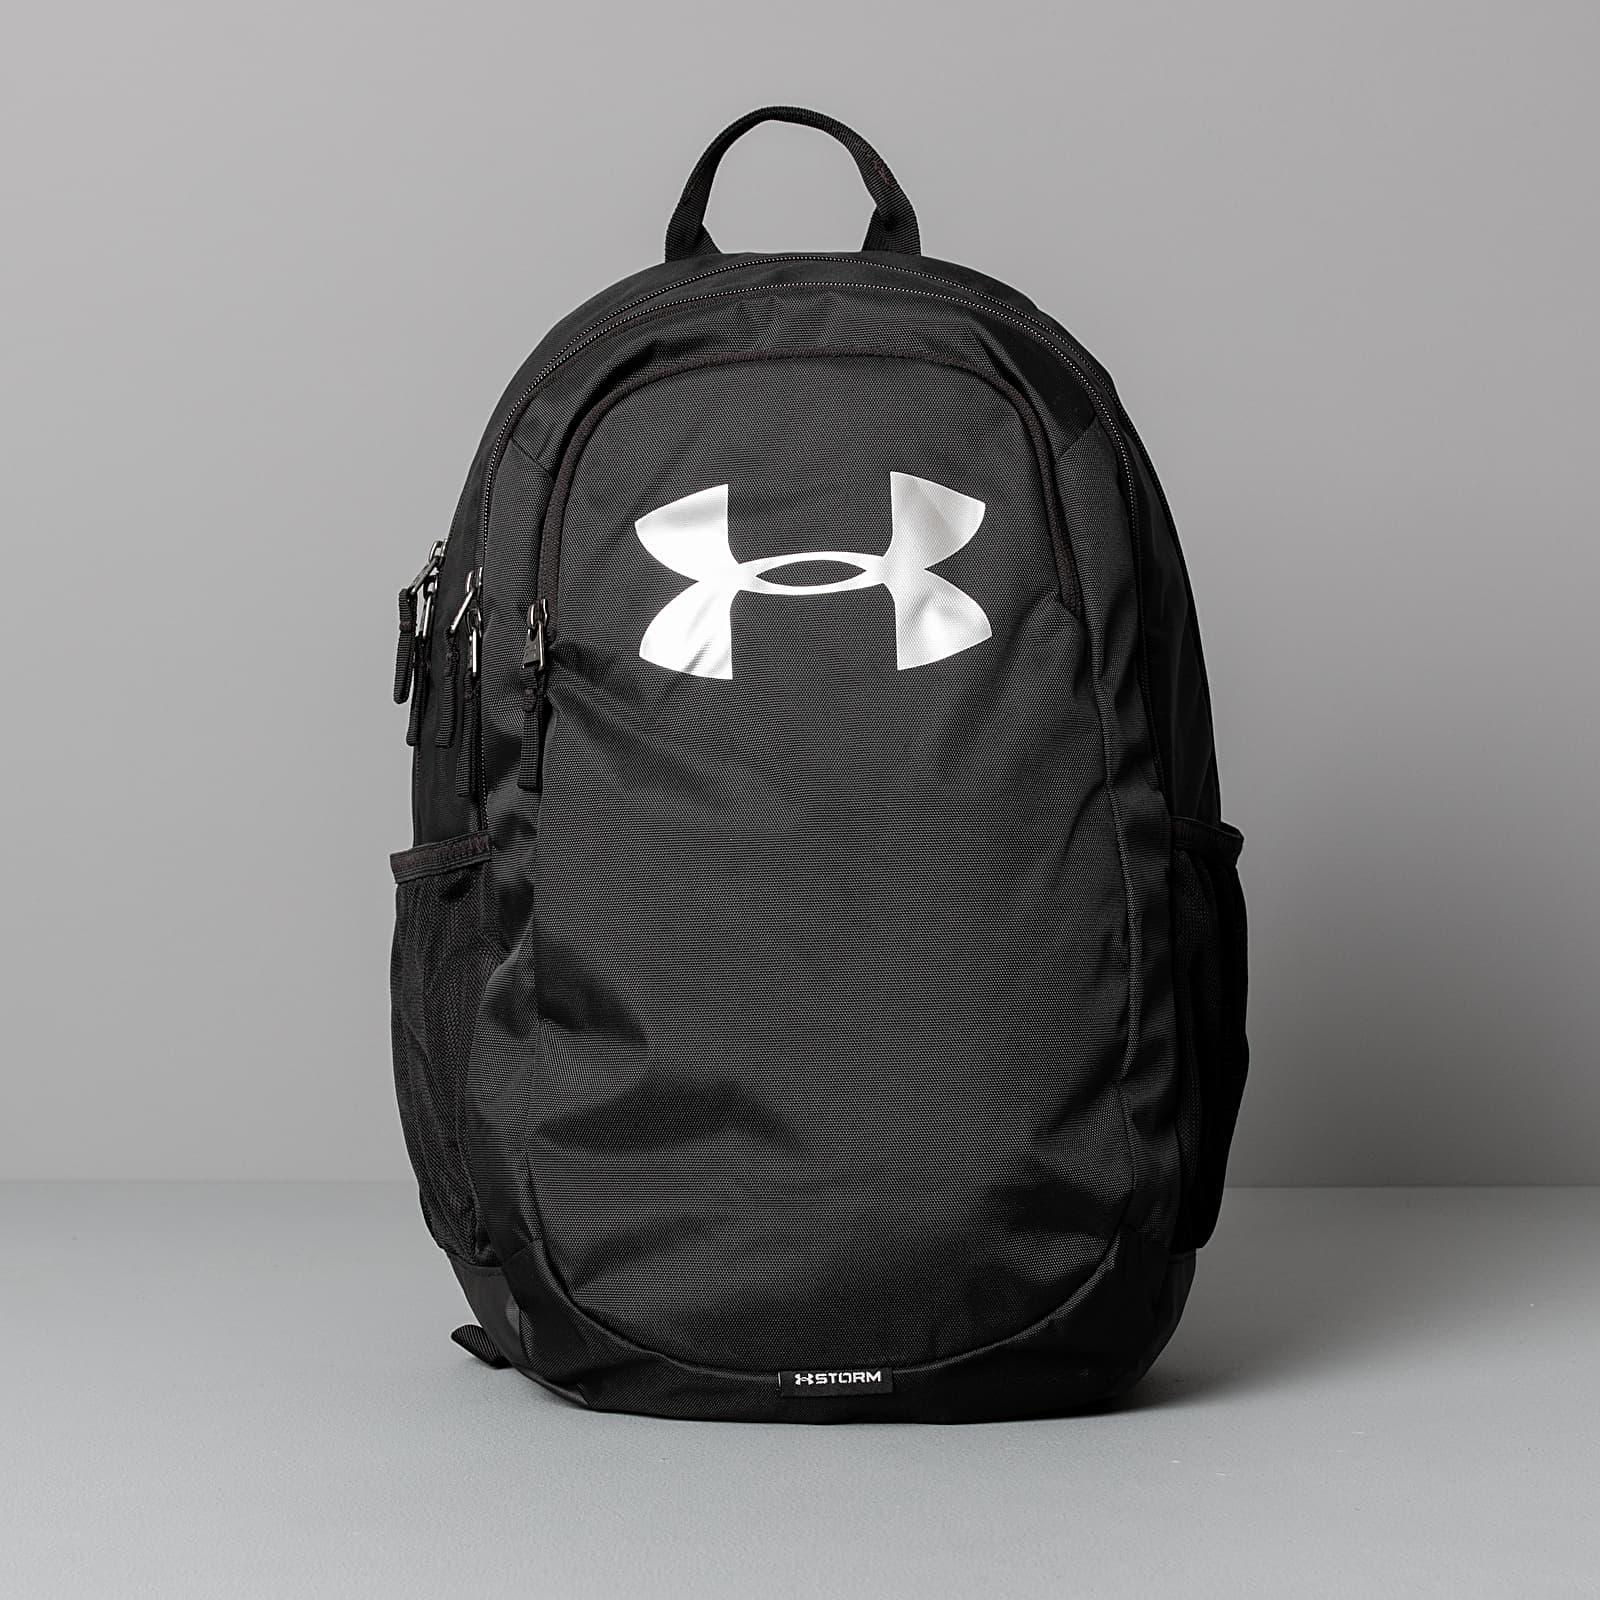 Backpacks Under Armour Scrimmage 2.0 Backpack Black